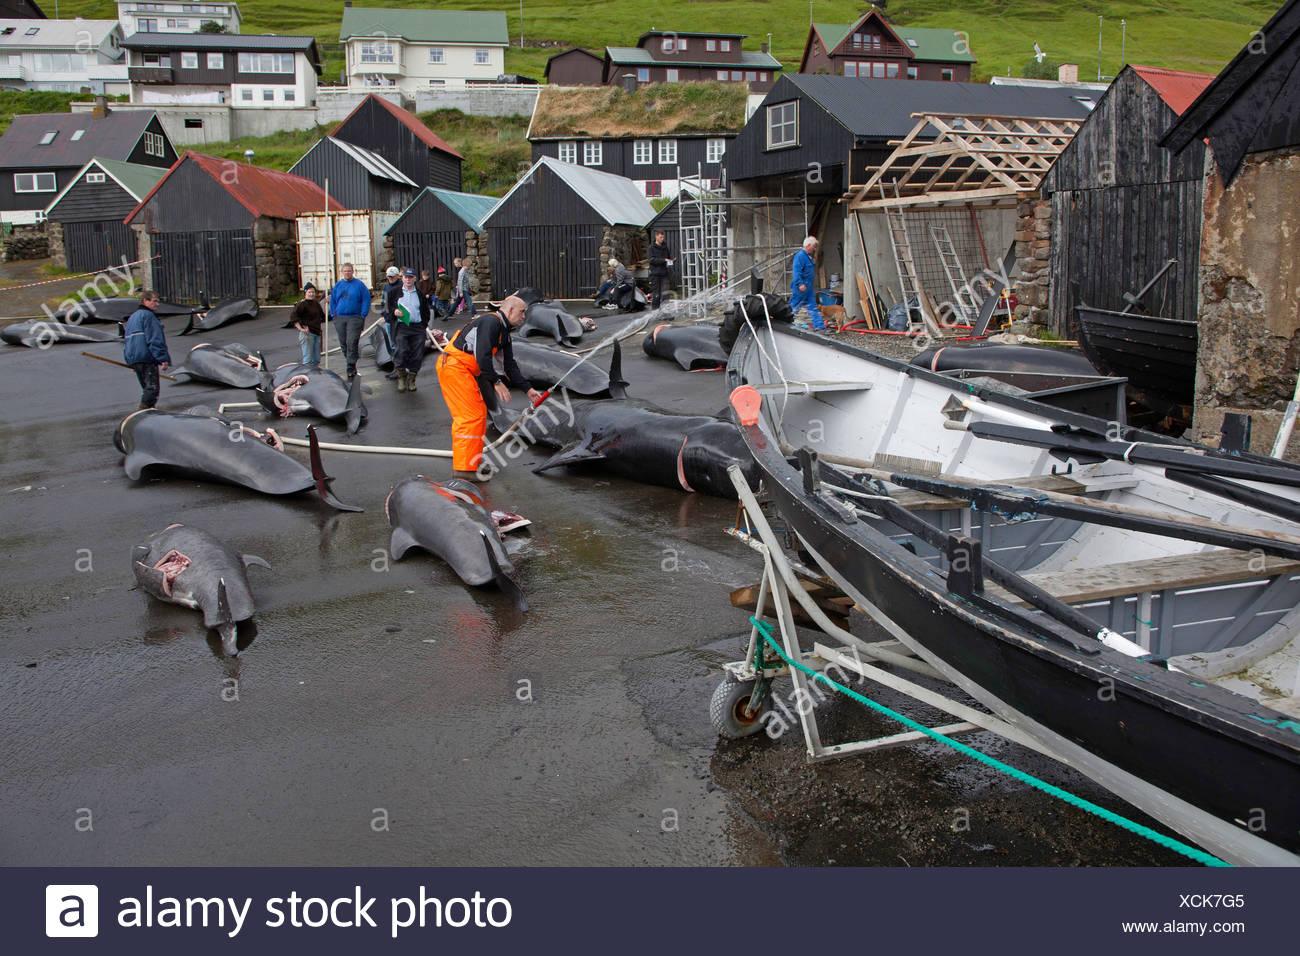 weißen Pilotwal, Kiffer Wal, Caaing Wal, Longfin Pilotwal, Atlantic Pilotwal, Blackfish (Globicephala Melas, Globicephala Melaena), viele Tiere auf dem Asphalt Boden einer Walfang-Base wird zerstückelt, Färöer Inseln Stockbild